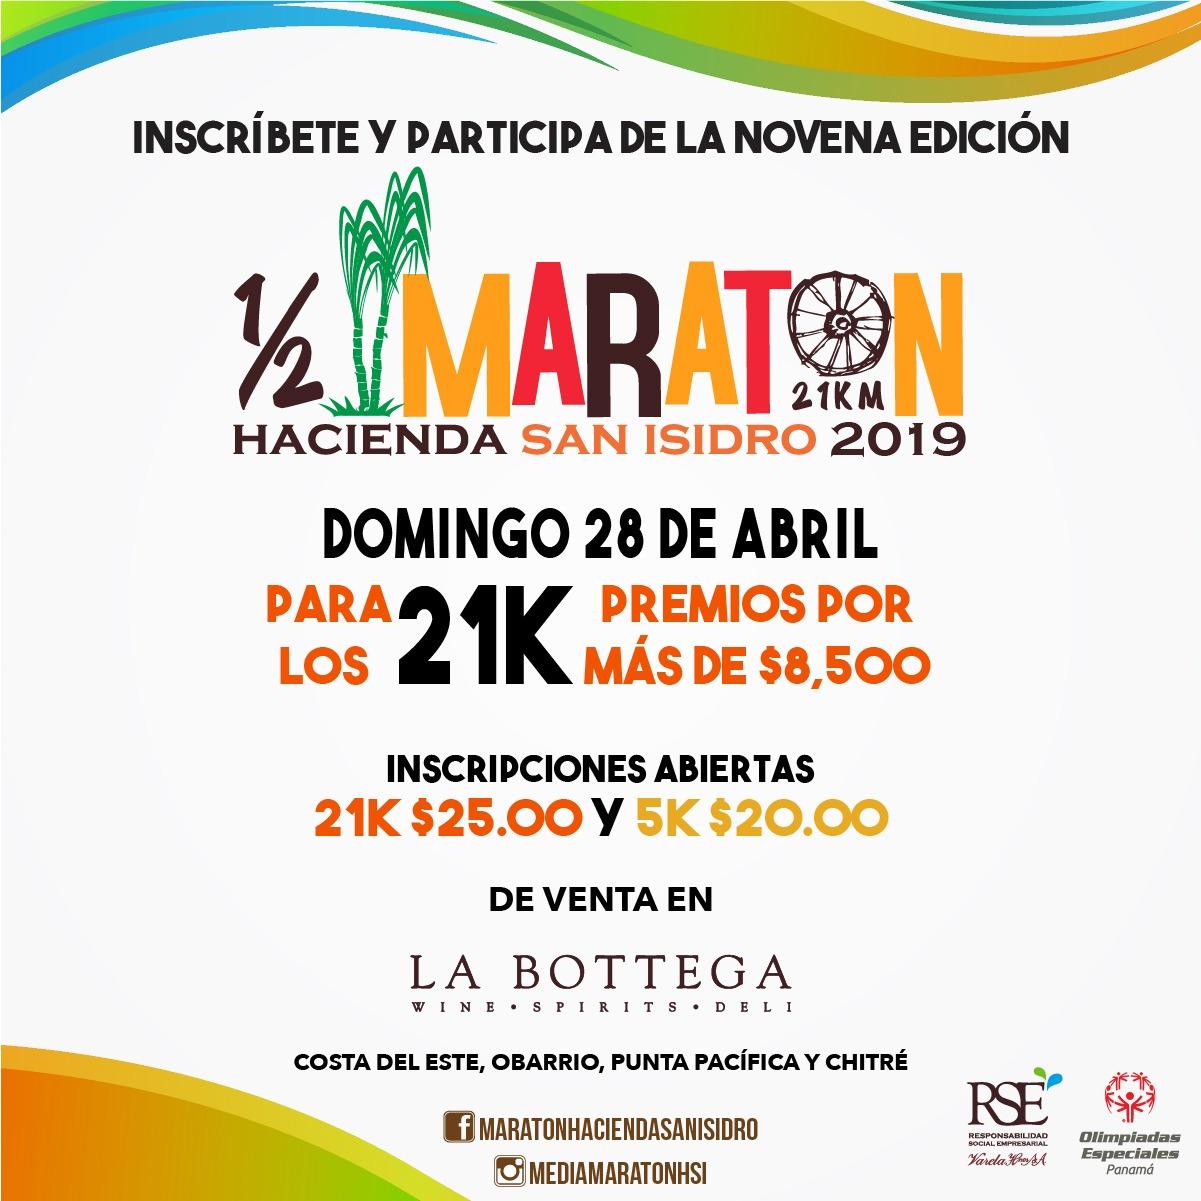 MEDIA MARATON  – HACIENDA SAN ISIDRO 2019